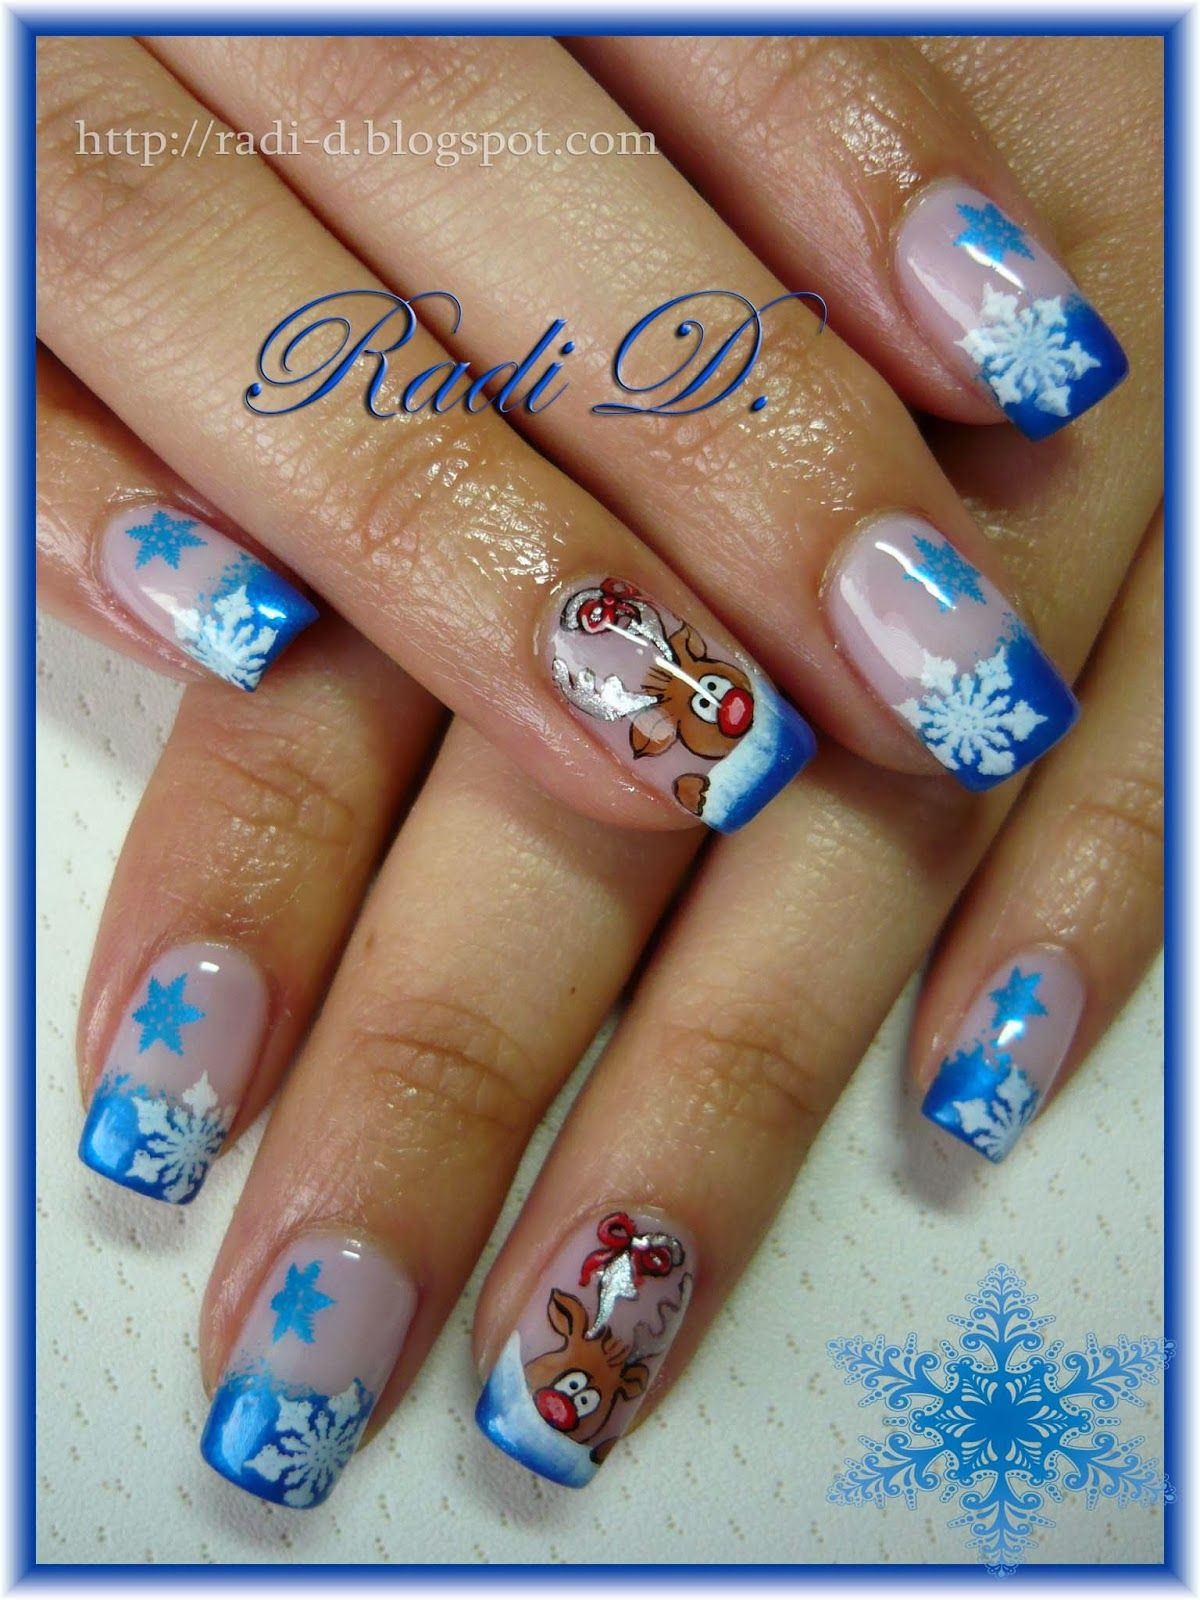 Its all about nails reindeer christmas nail nails nailart its all about nails reindeer christmas nail nails nailart prinsesfo Image collections